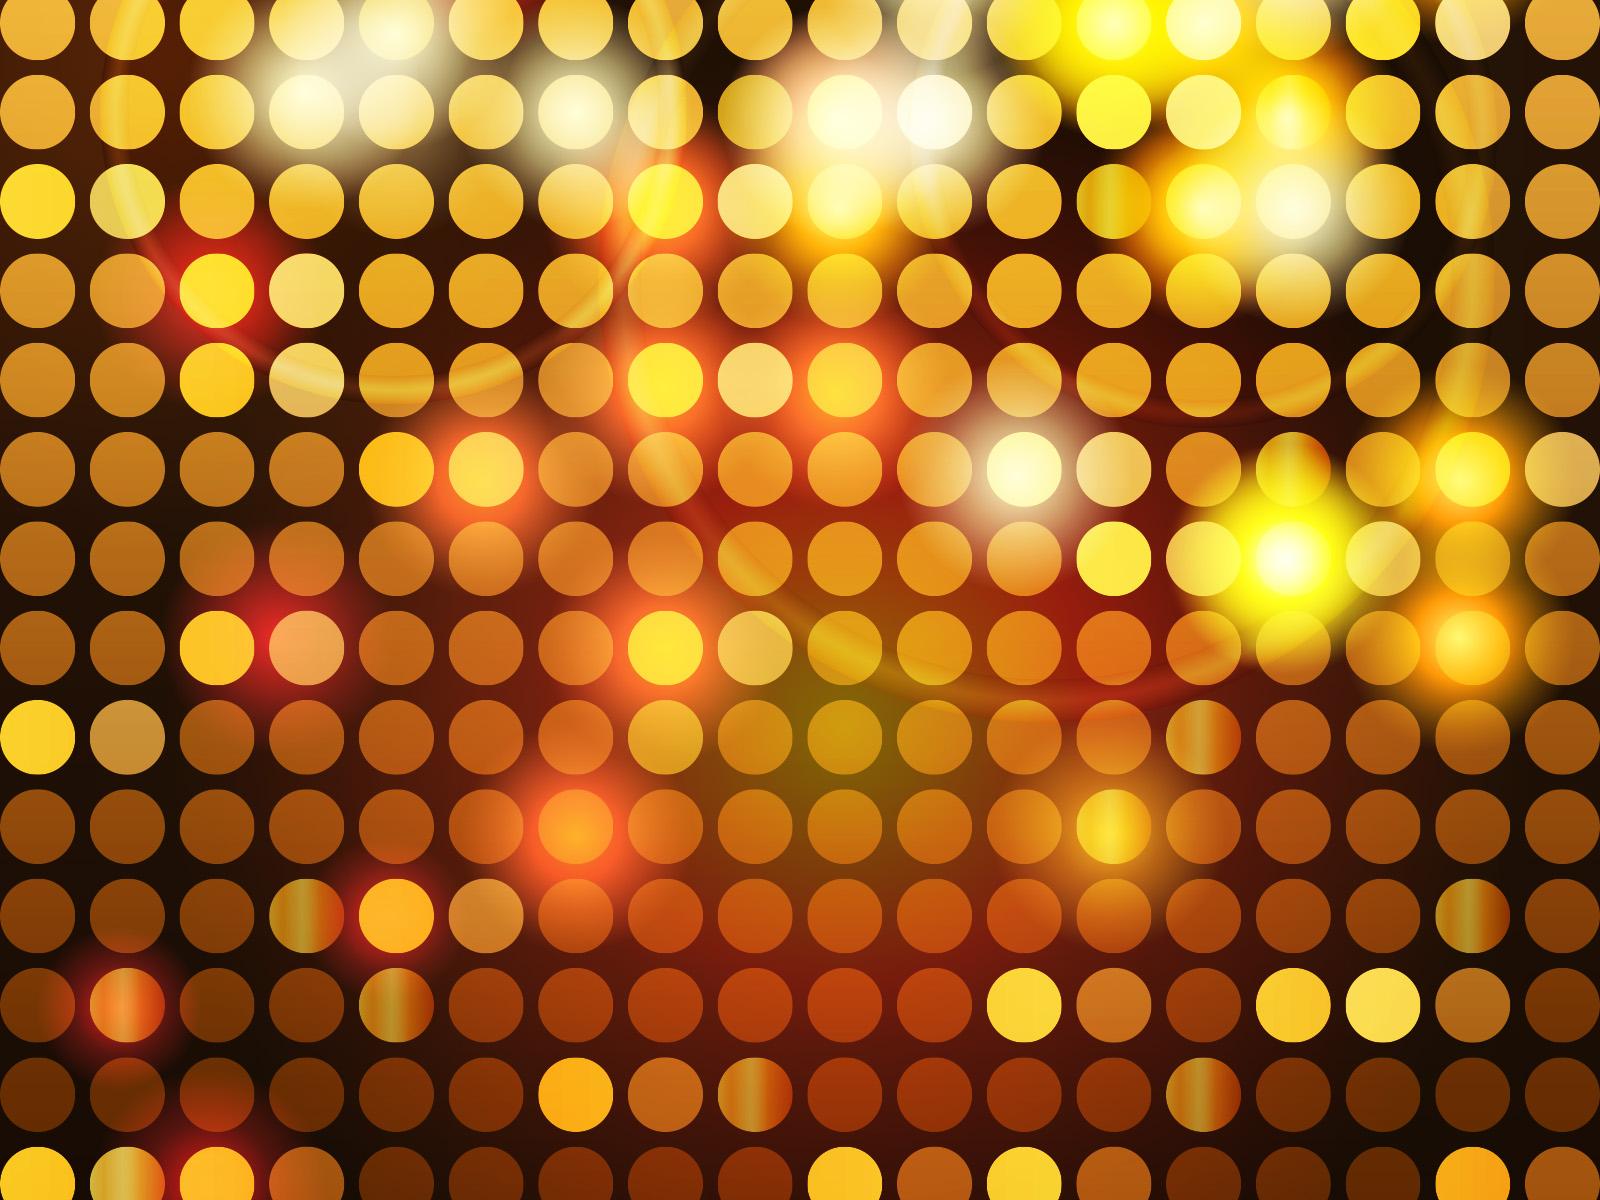 Brown Red And Orange Home Decor Shiny Golden Mosaic Backgrounds Black Orange Pattern